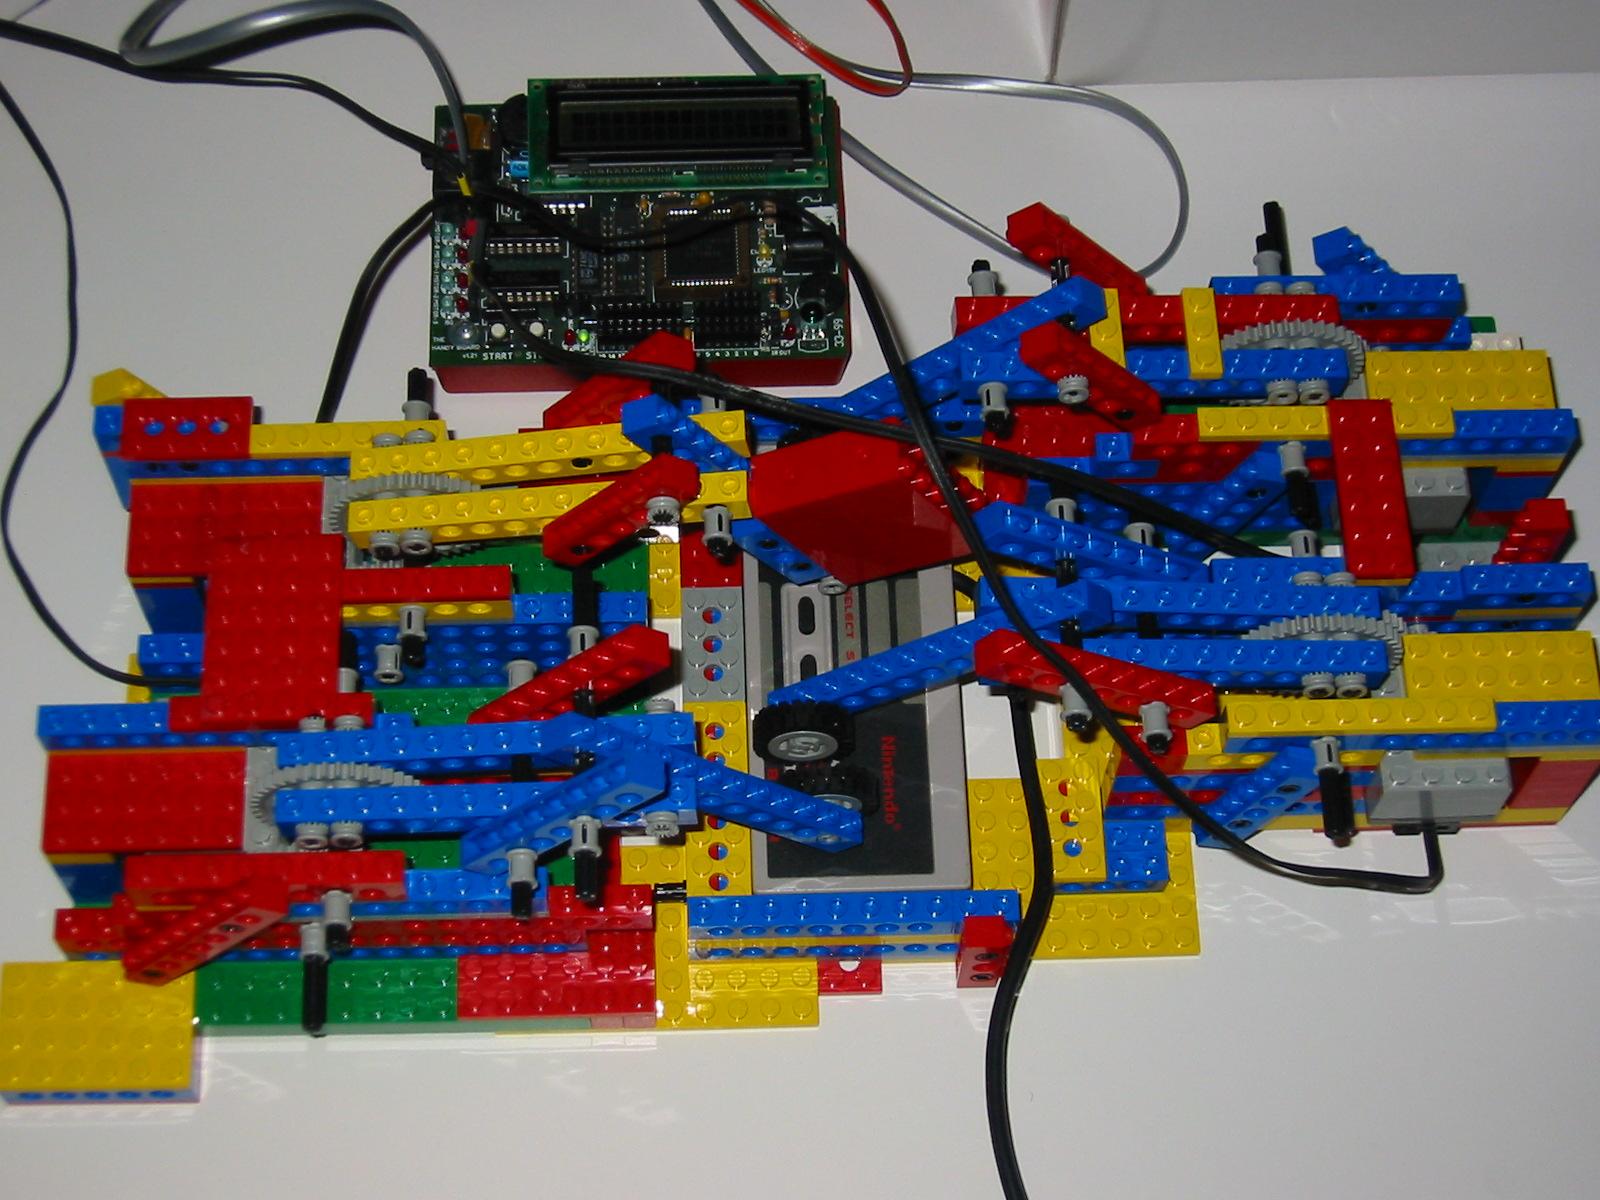 Lego Robot Plays Mario Wonderland